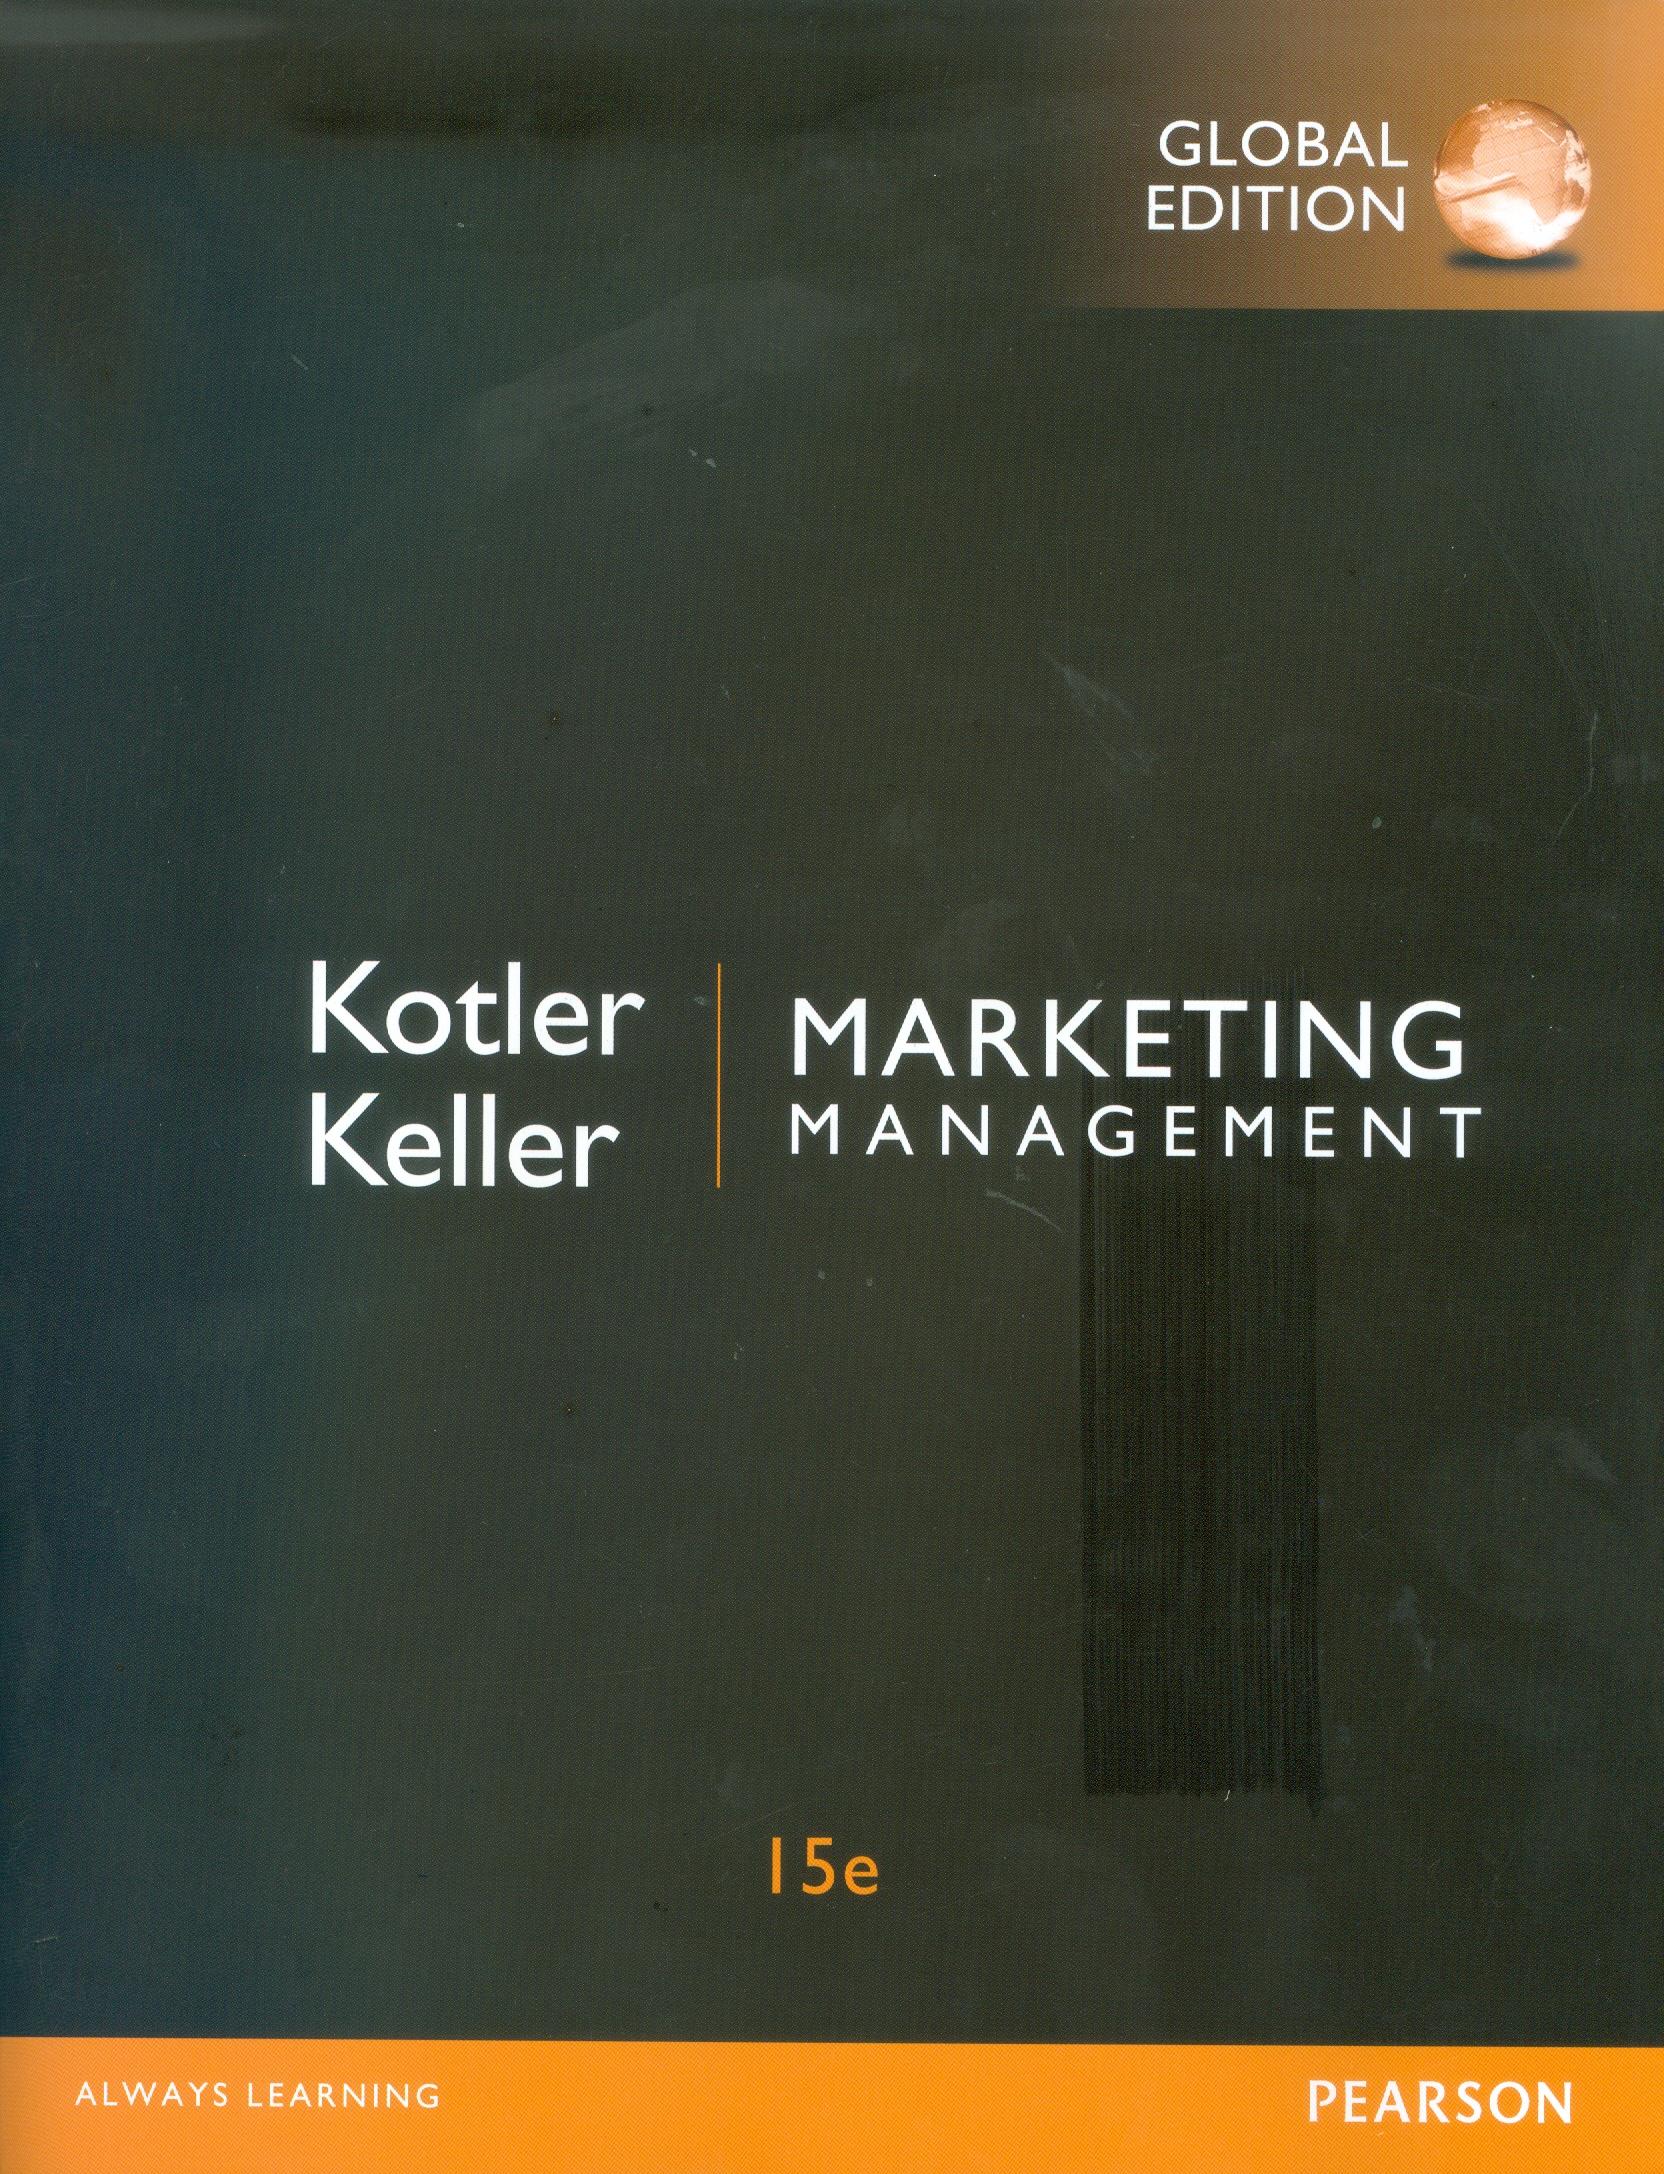 marketing management0001.jpg